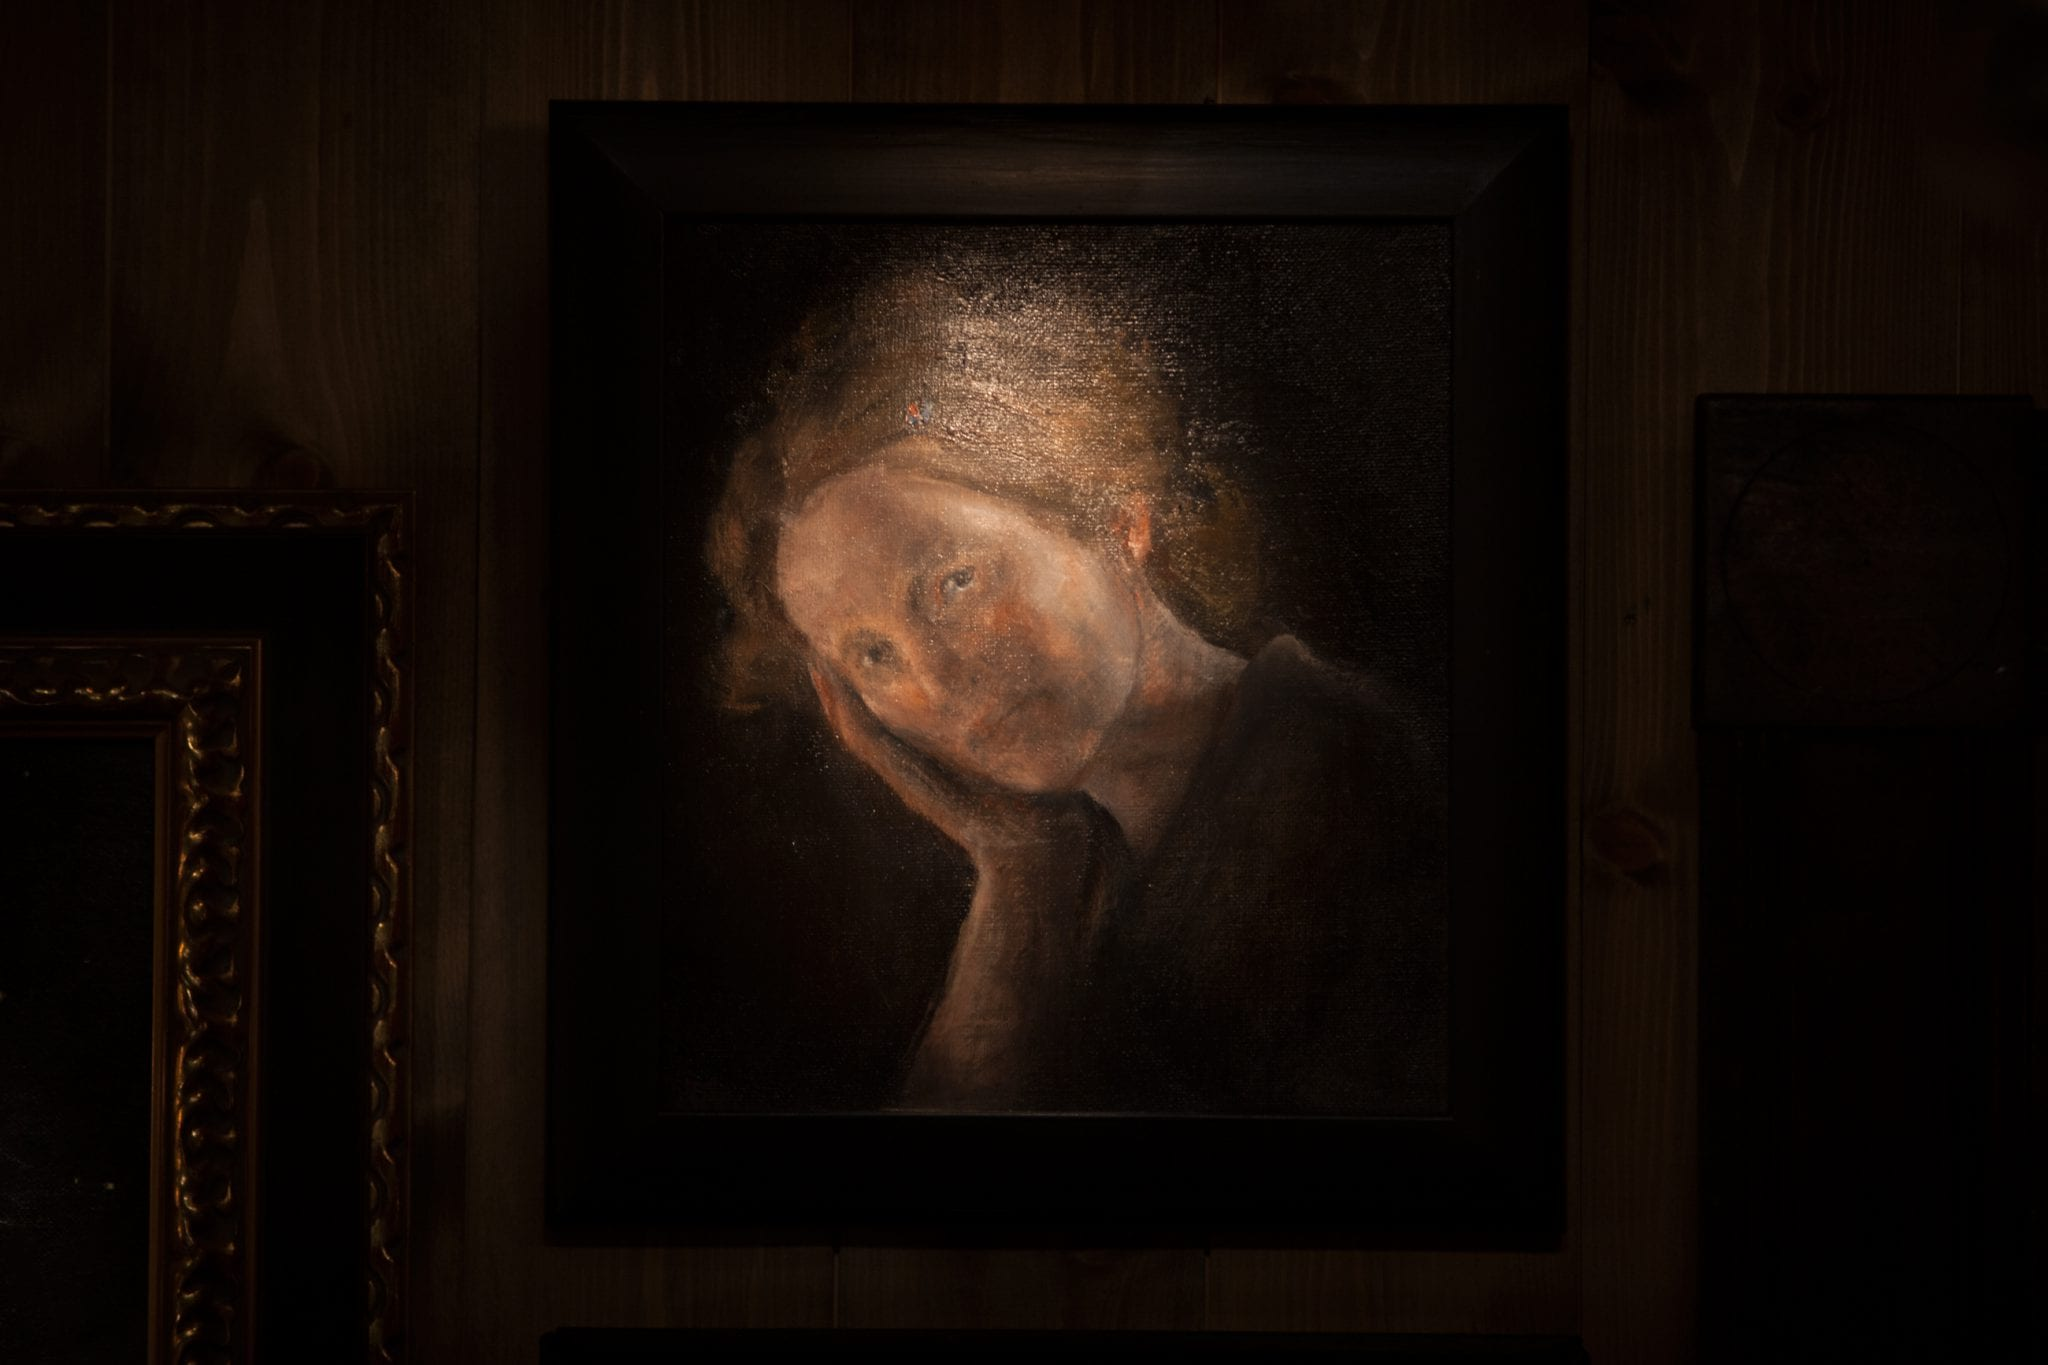 Turid Spildo, self-portrait.